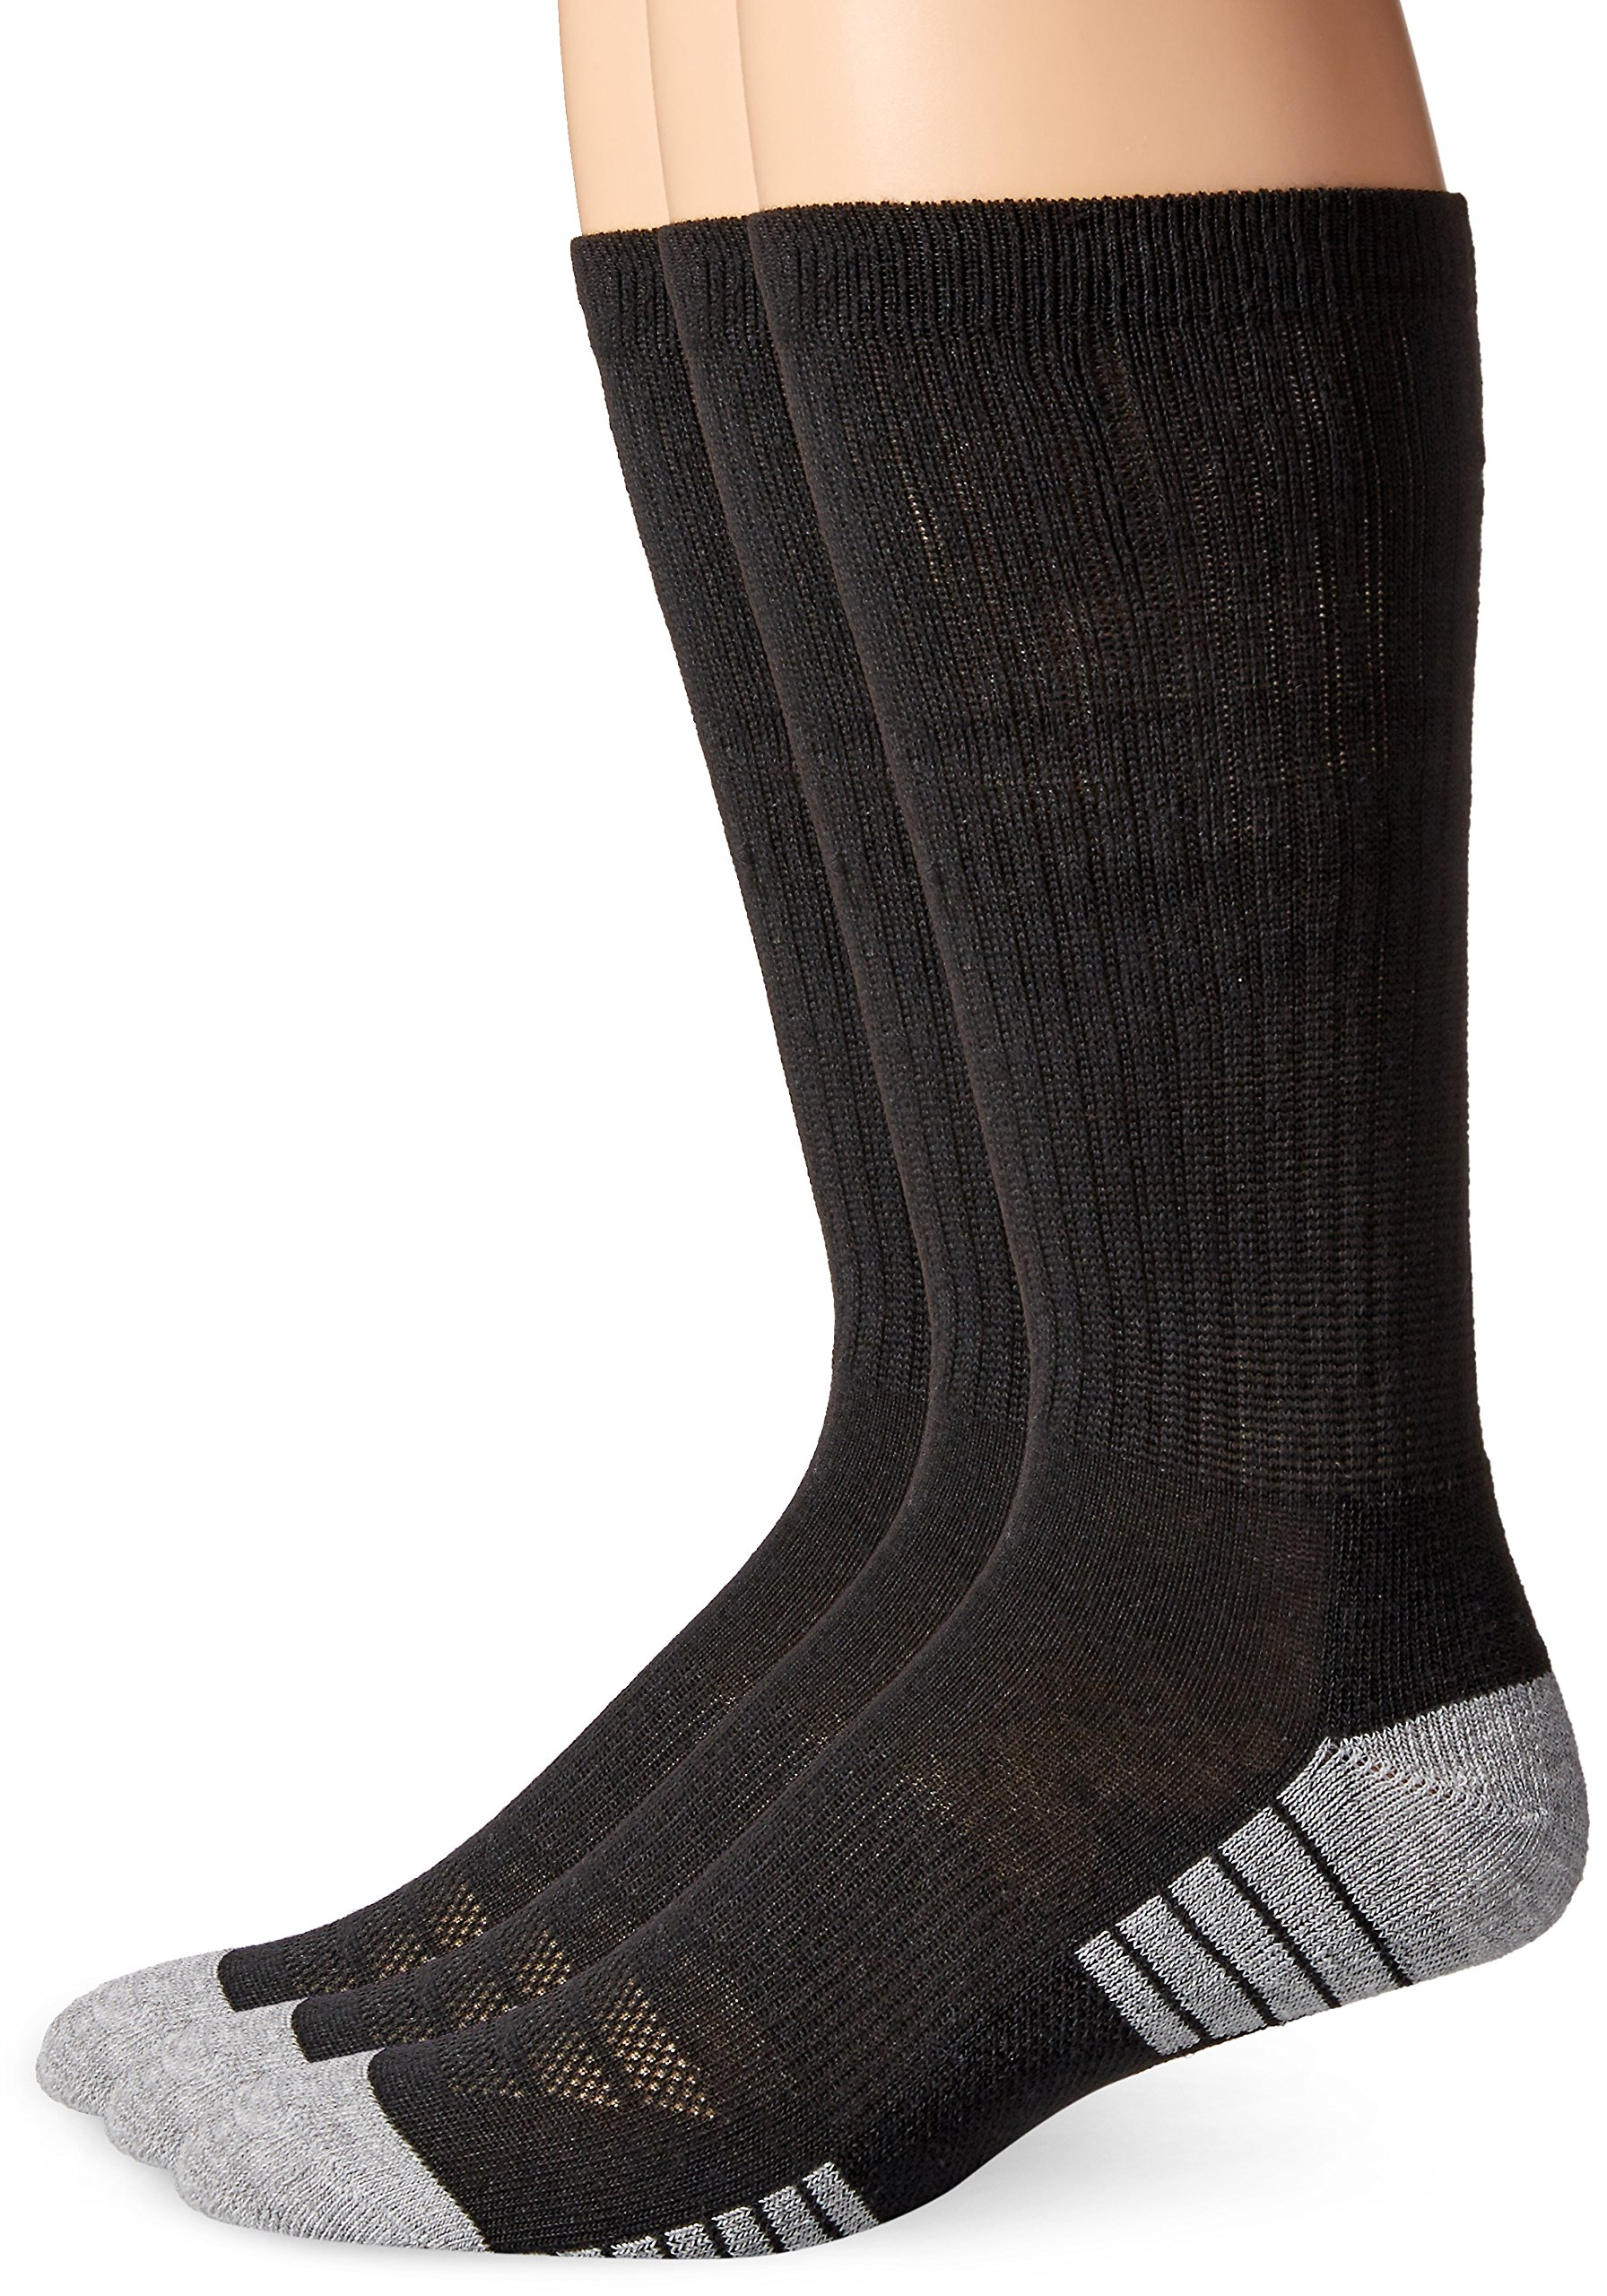 Under Armour Men's Heatgear Tech Crew Socks, Black, X-Large (3 Pair Pack)